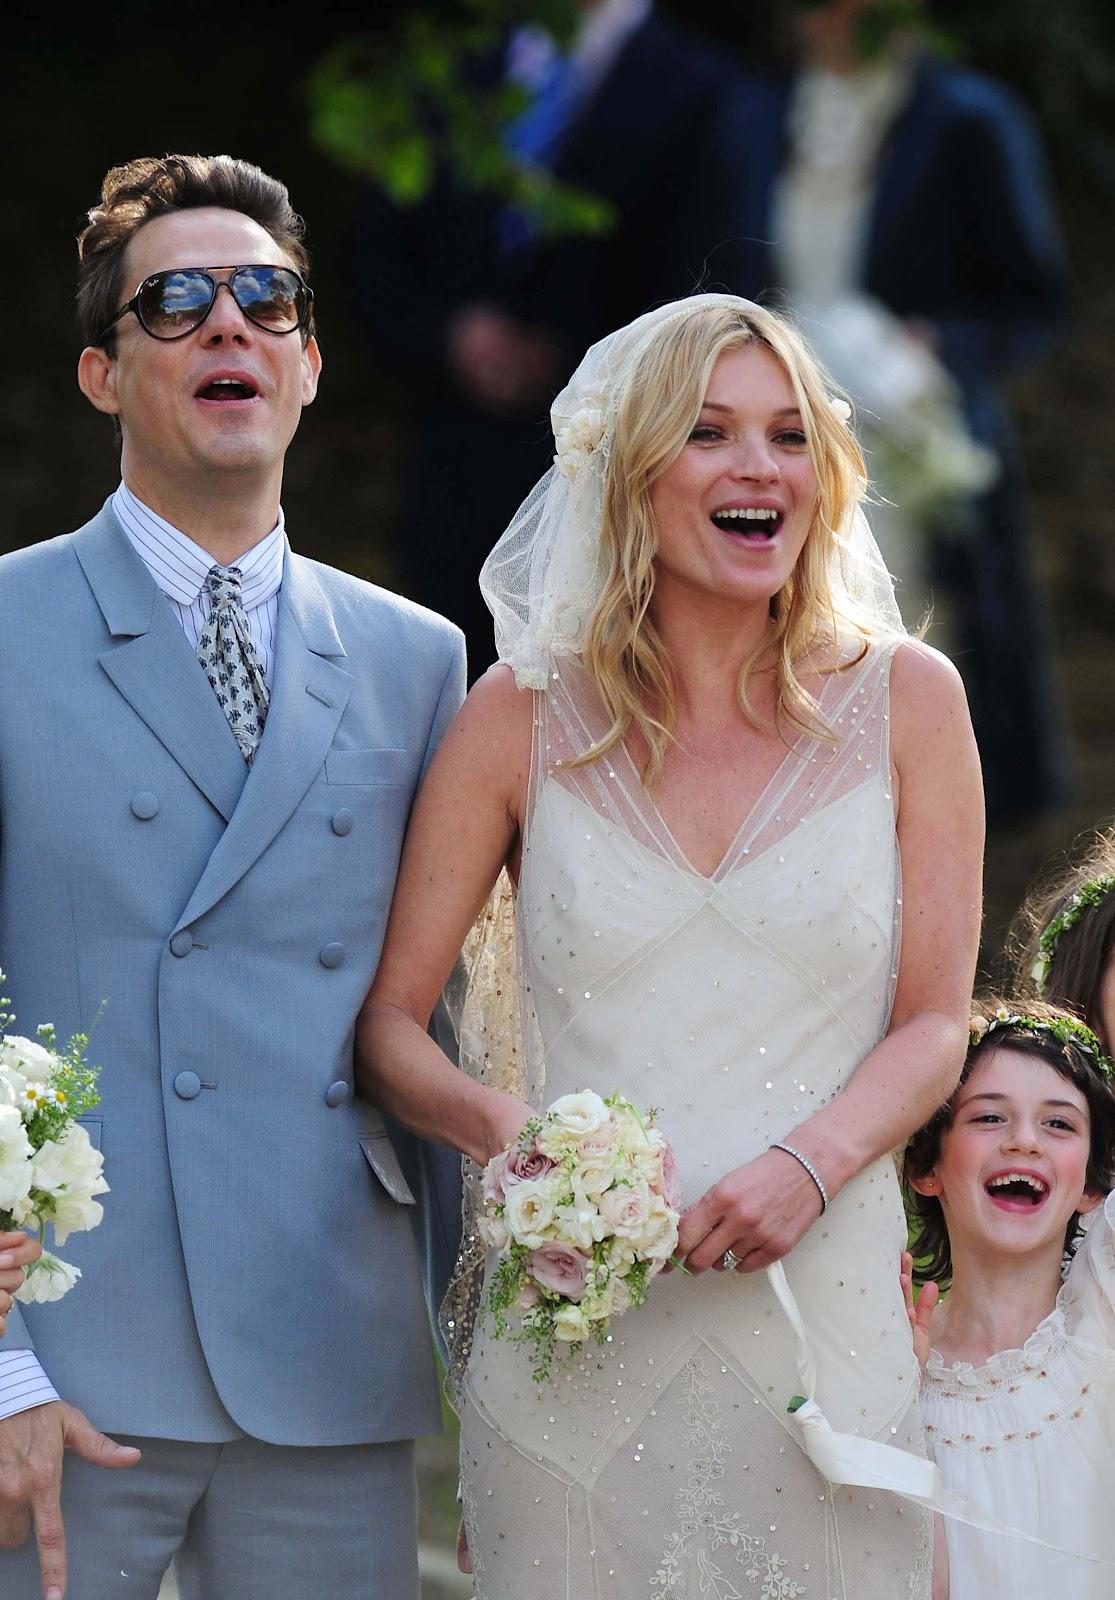 http://2.bp.blogspot.com/-mlmmmGZ_fNU/T9i29sON5JI/AAAAAAAAC9o/PPXYAwbHKeo/s1600/XU5058265@Kate-Moss-wedding.jpg